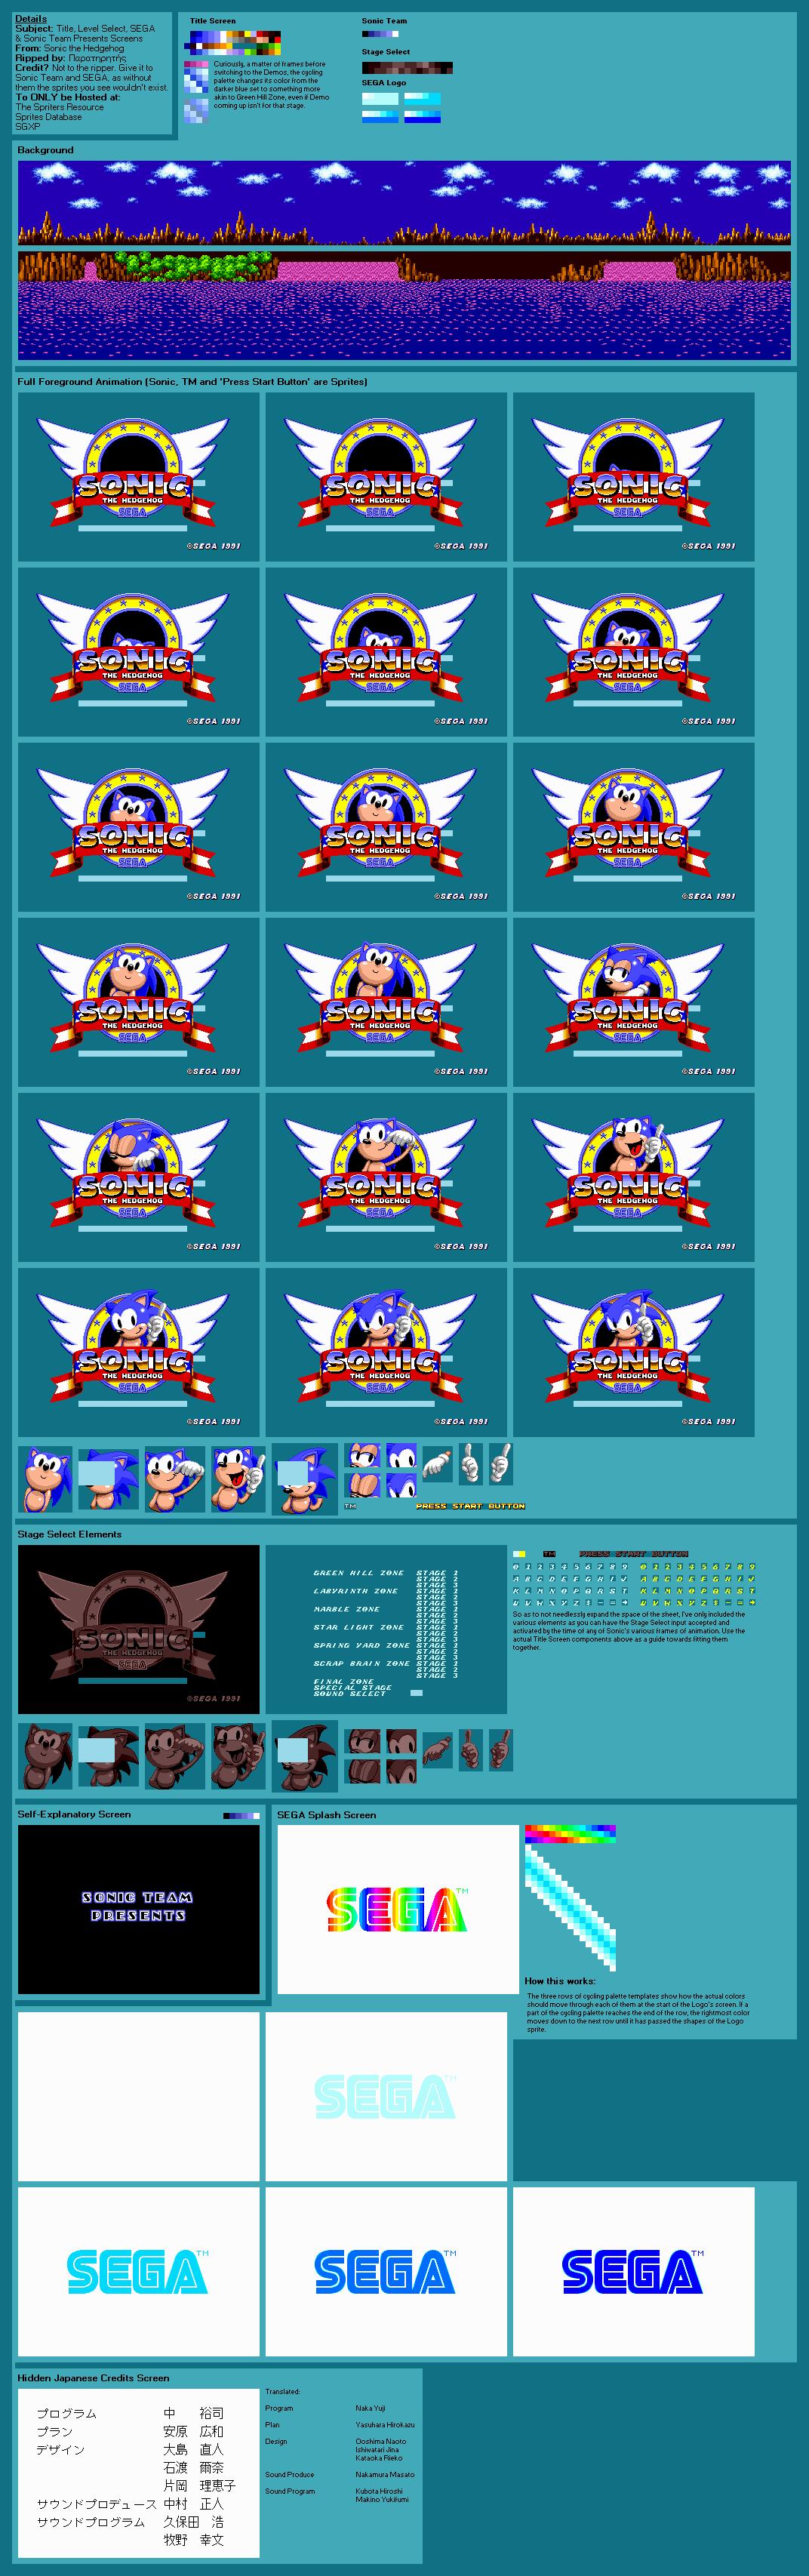 Genesis 32x Scd Sonic The Hedgehog Title Screen The Spriters Resource